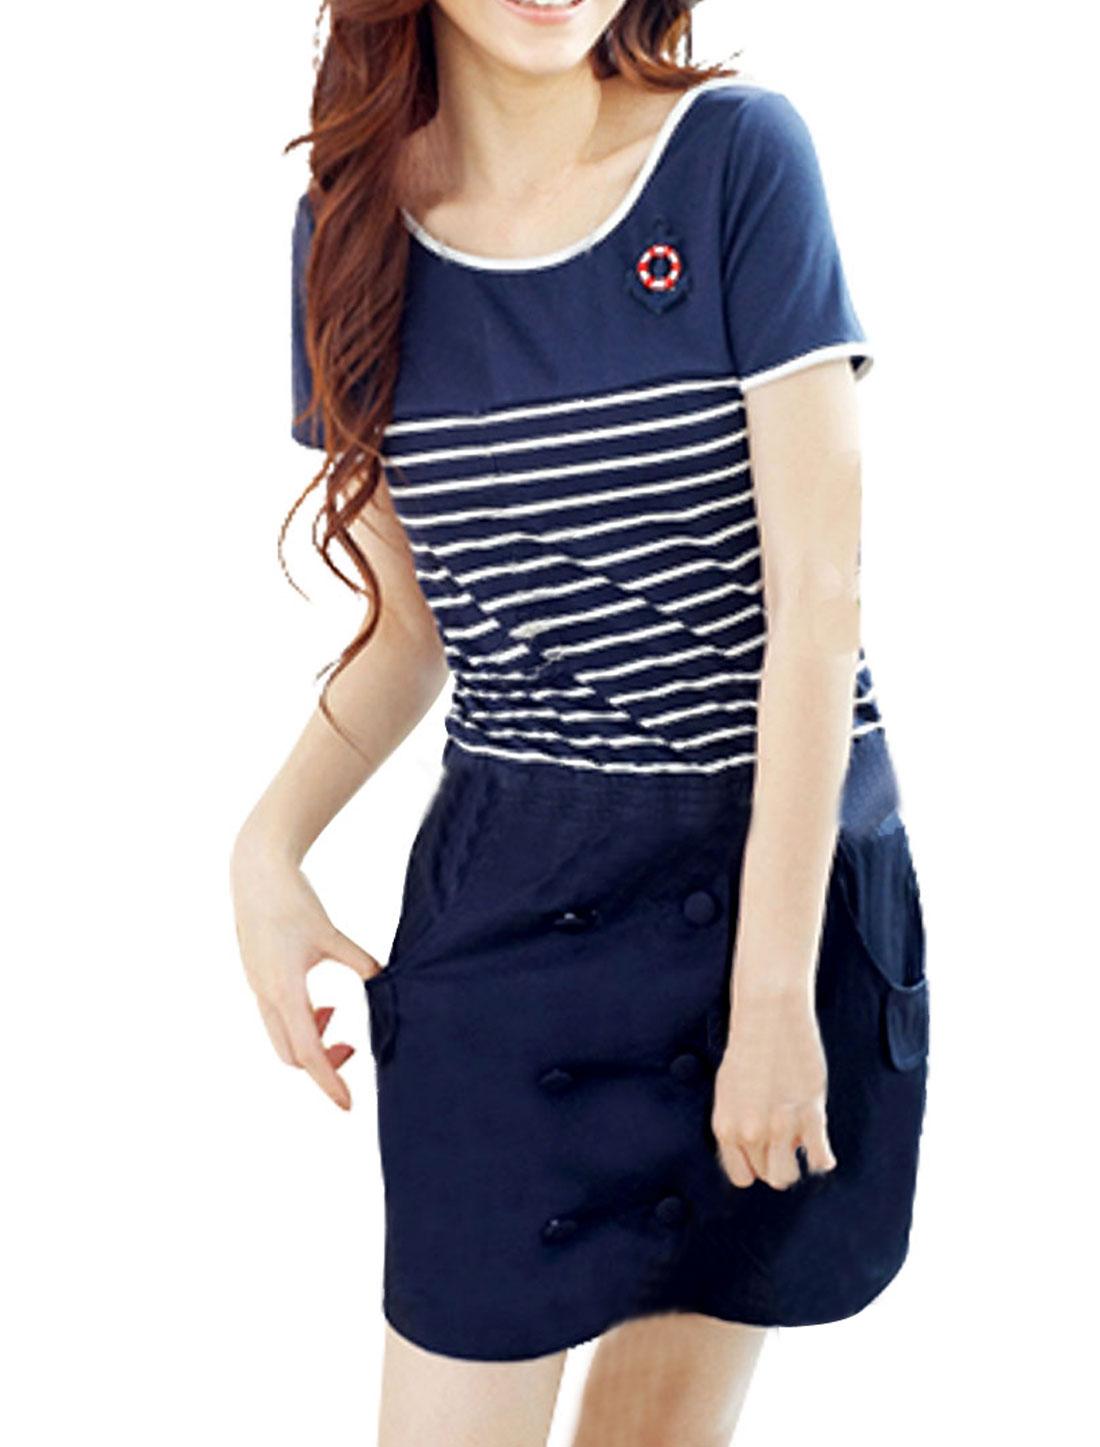 Women Scoop Neck Short Sleeves Striped Mini Dress Blue XS